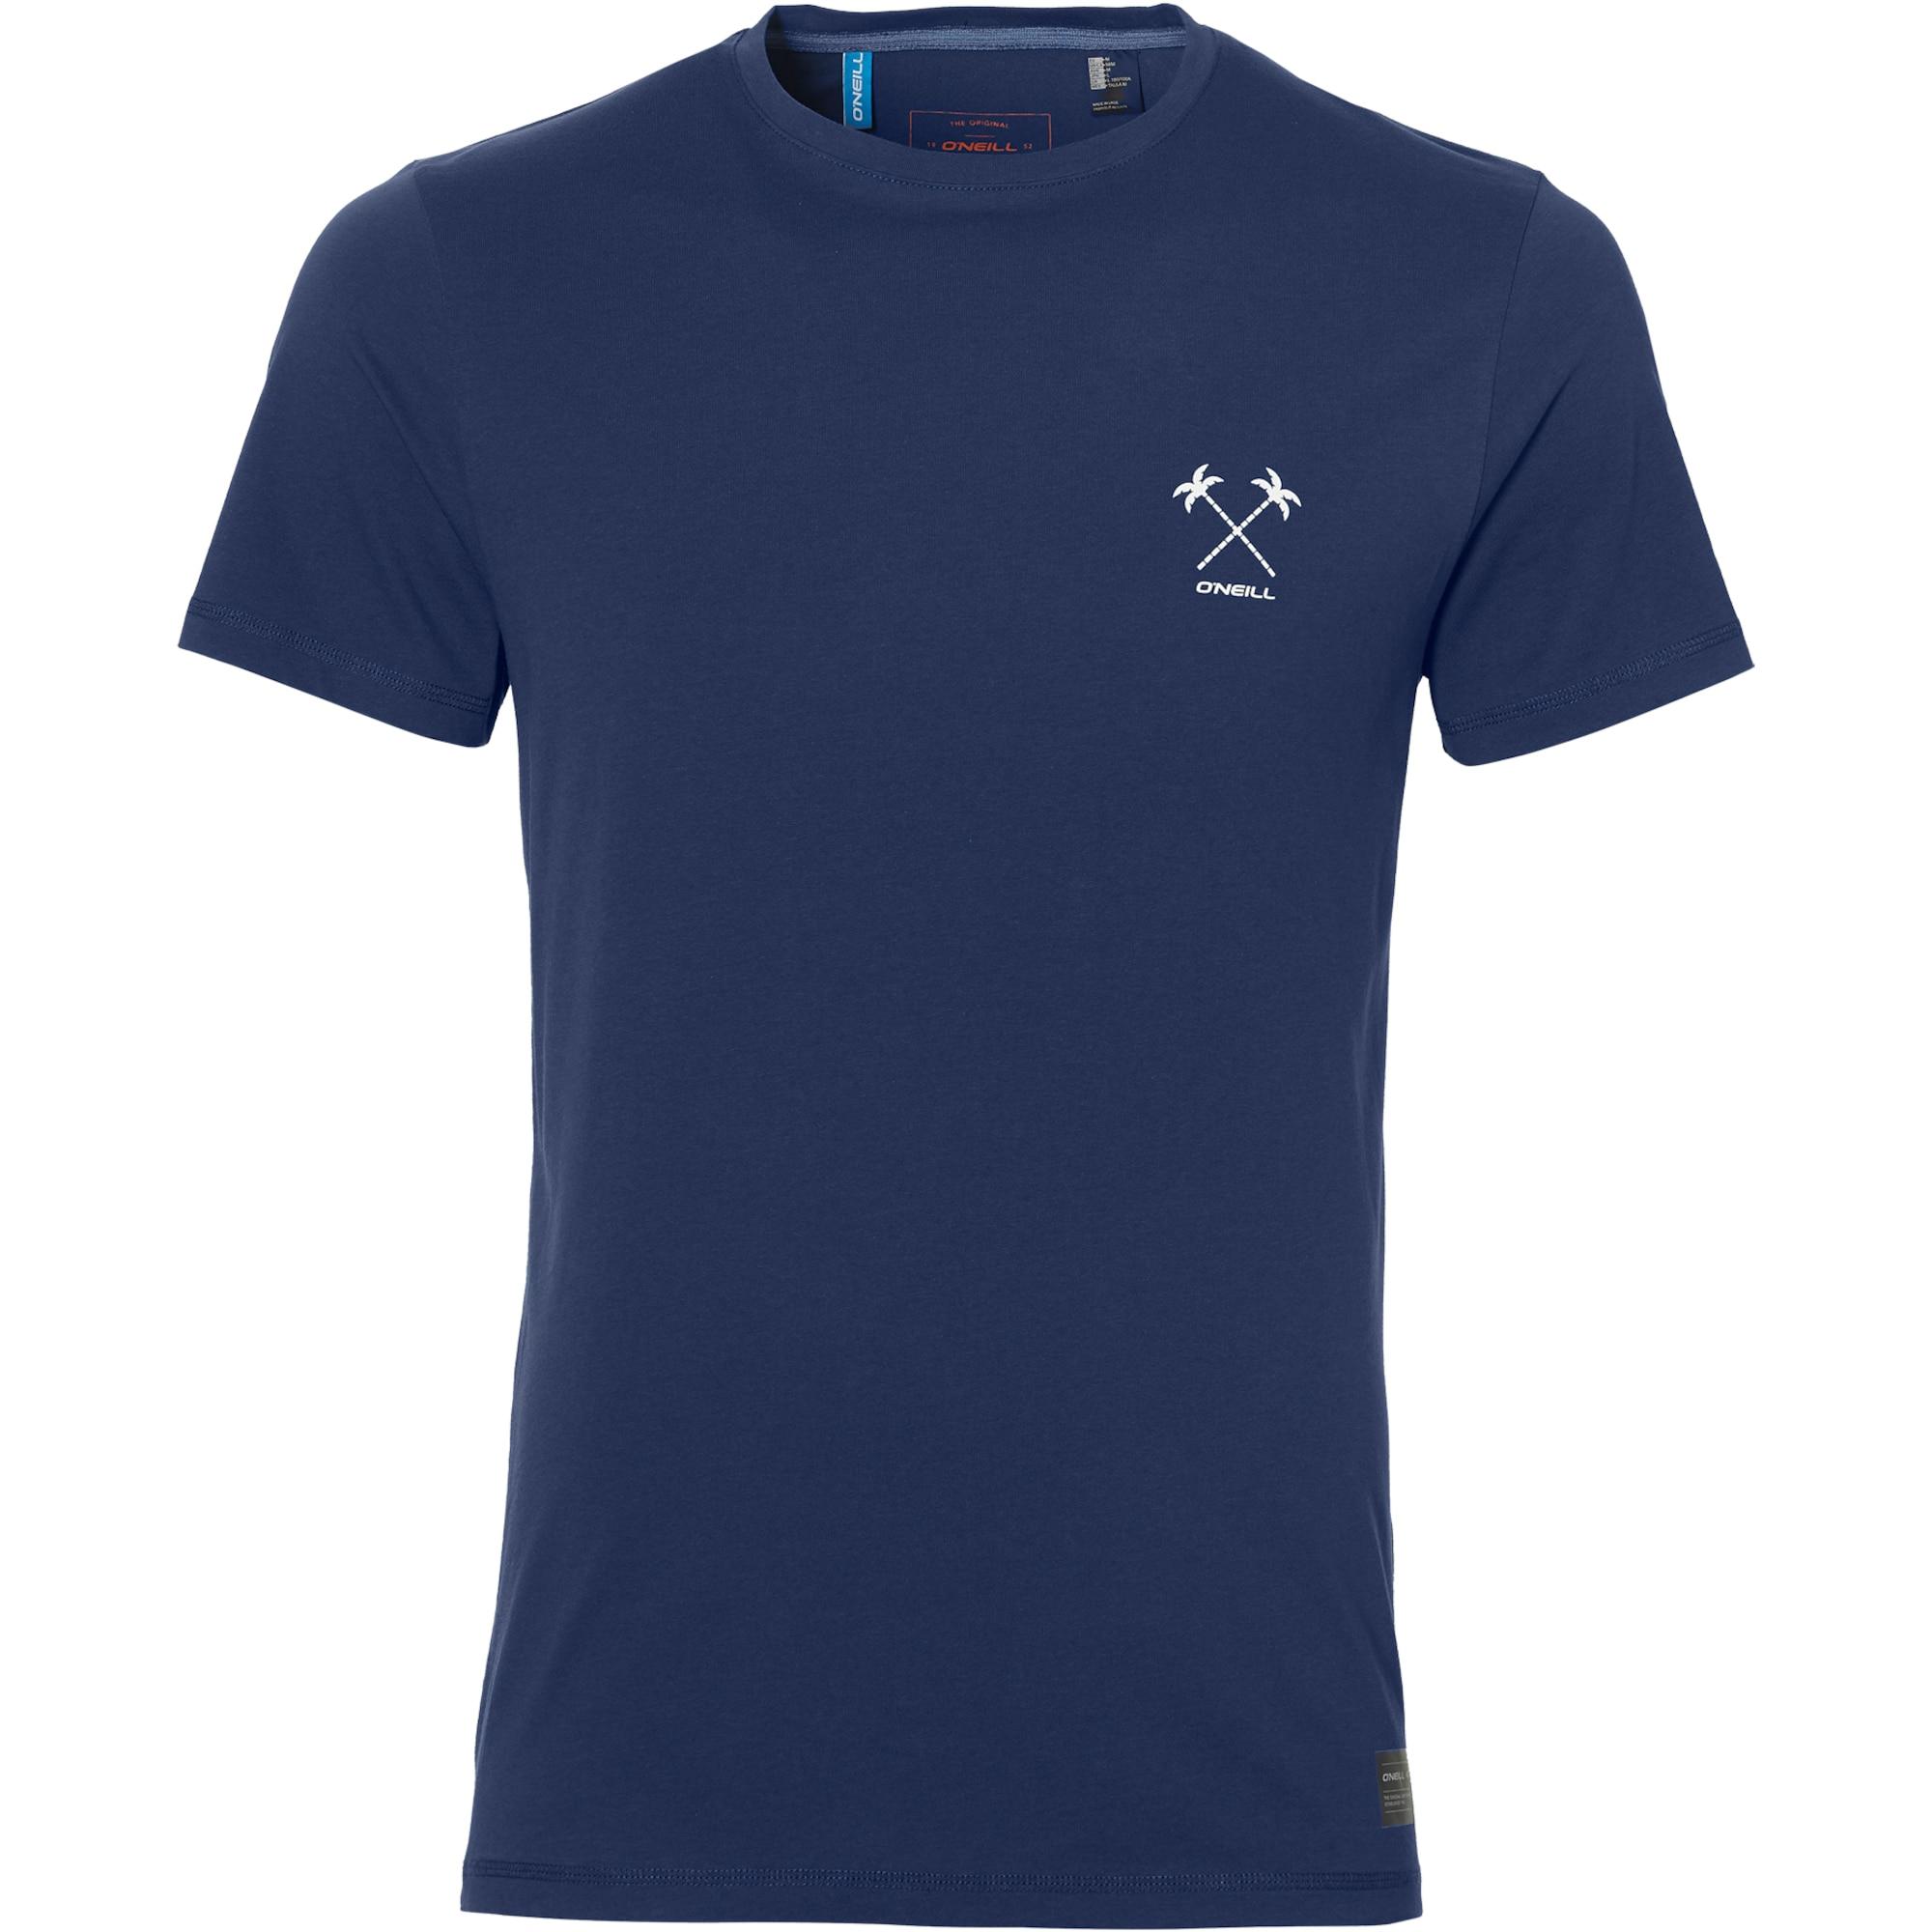 ONEILL Funkční tričko tmavě modrá O'NEILL